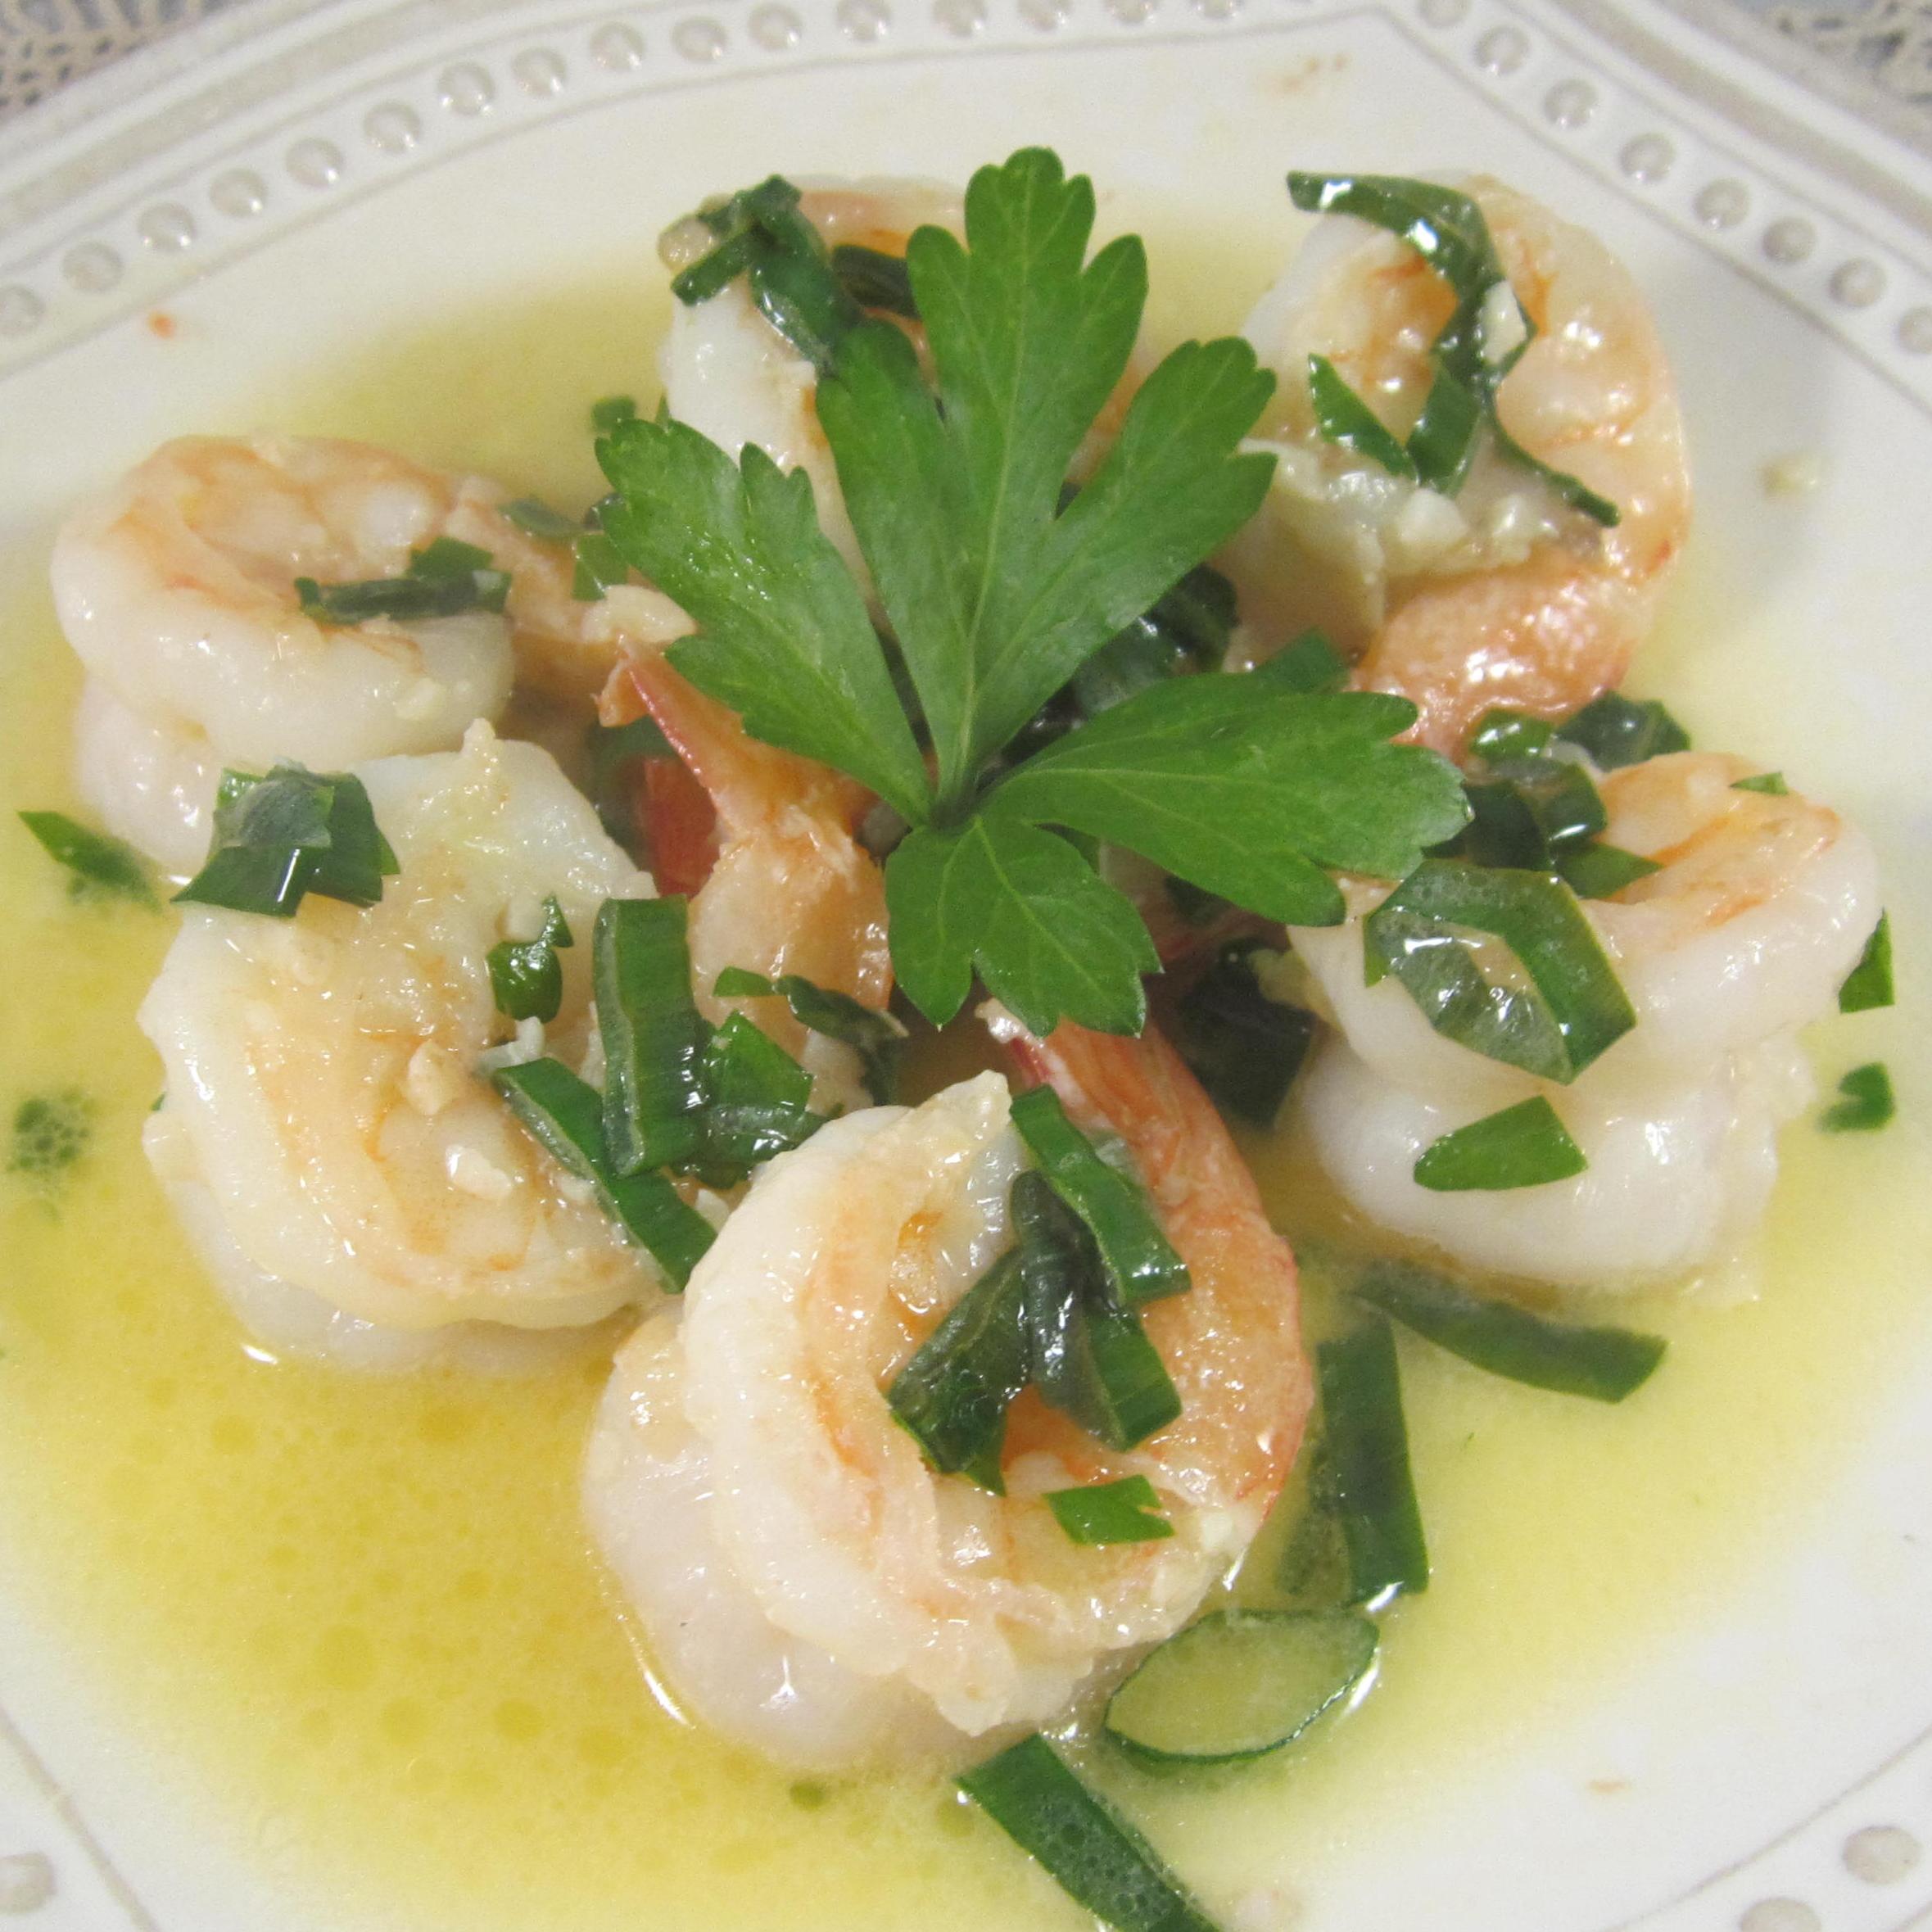 Sauteed Shrimp with Garlic, Lemon, and White Wine